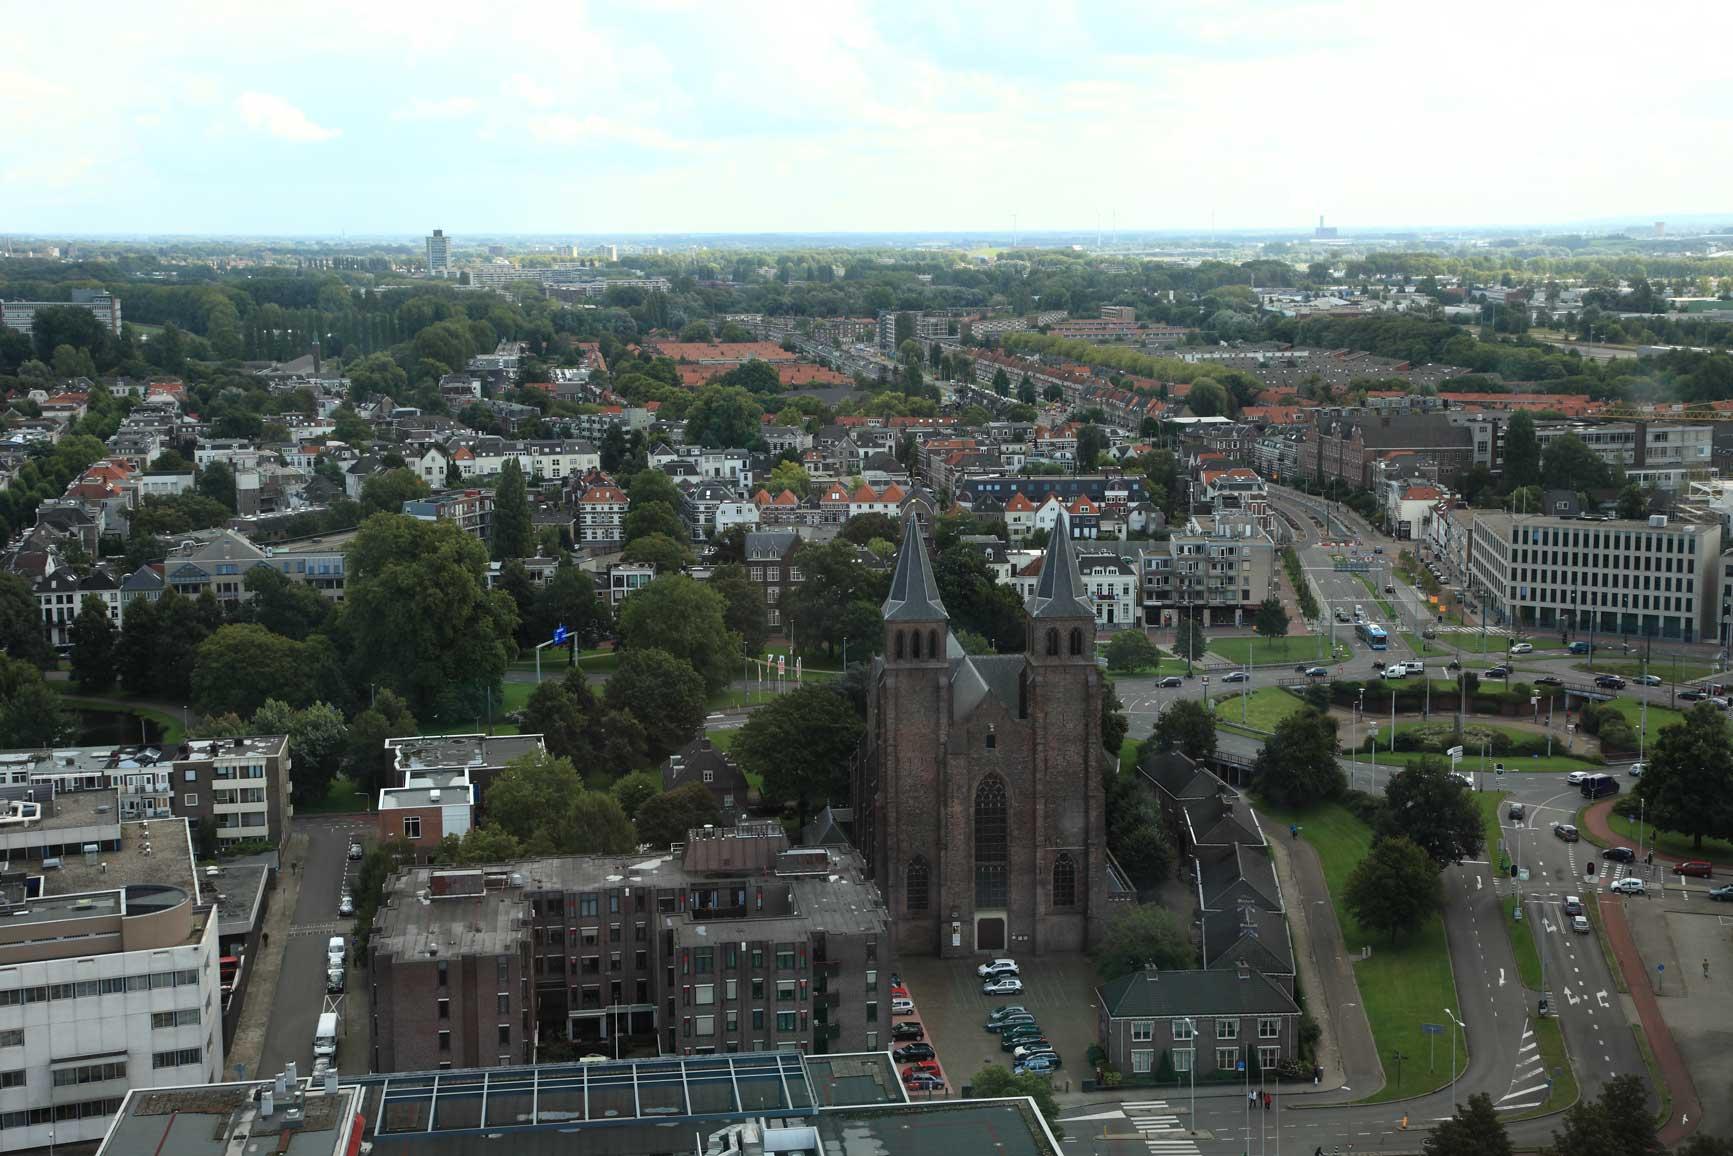 Rhine-20-08-14_14-10-37